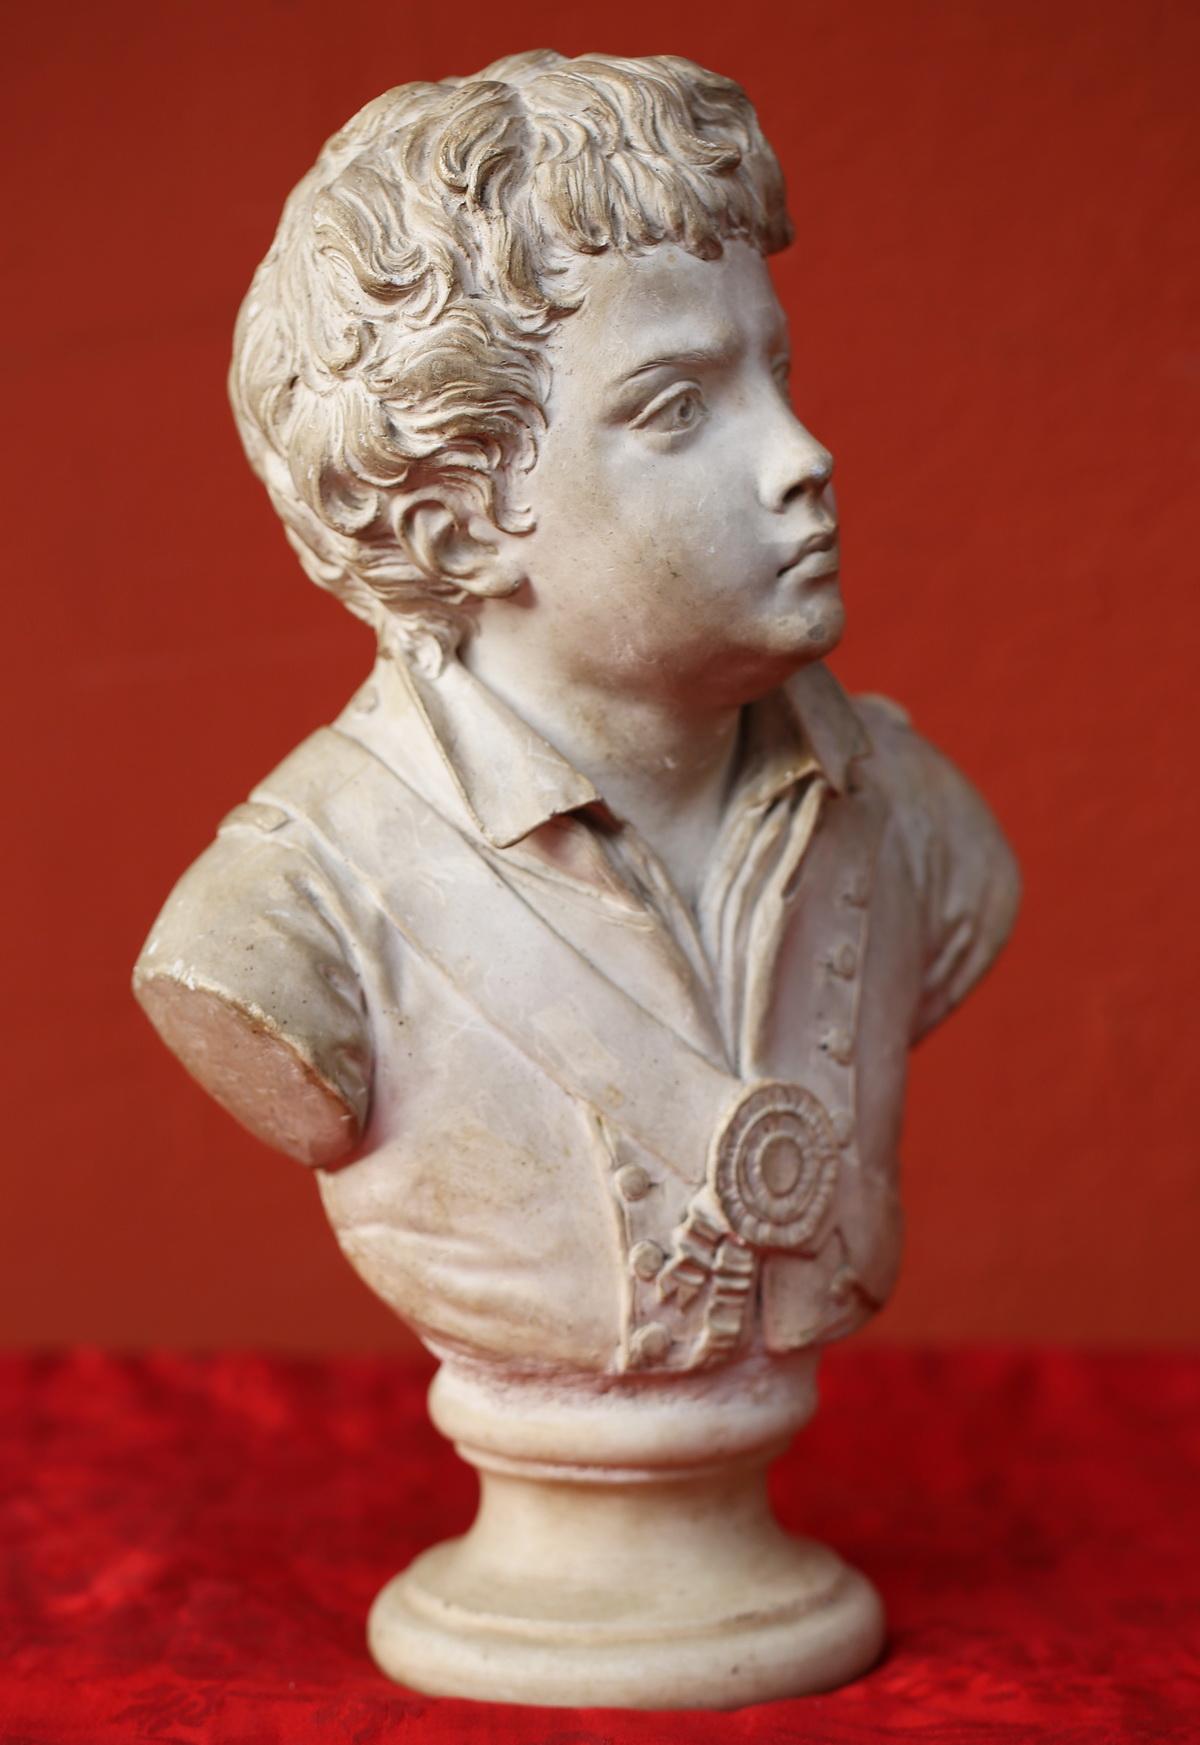 JEAN-NICOLAS ALEXANDRE BRACHARD 1766-1846